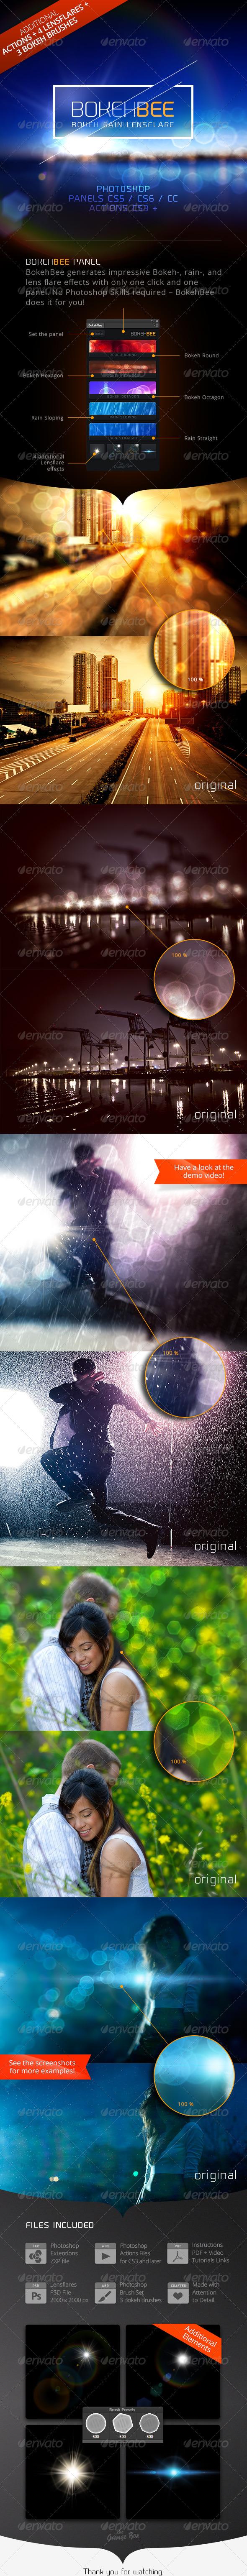 GraphicRiver BokehBee Bokeh Rain Lens-Flare Generator 6858473